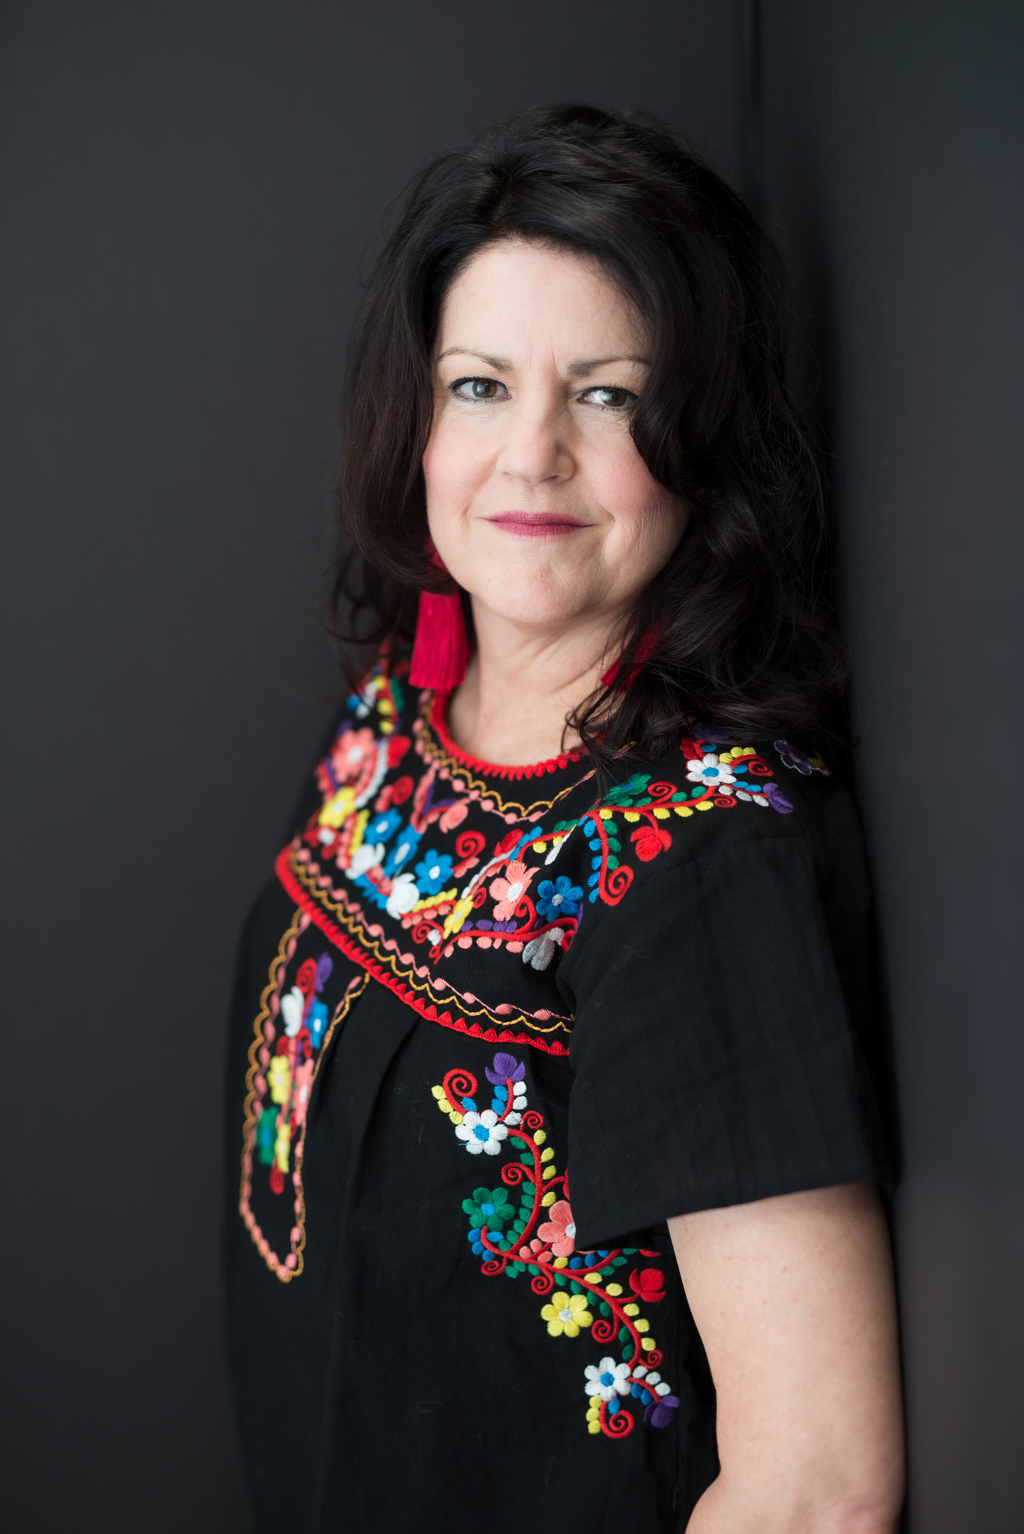 Deborah Cox Psychologist, Therapist, Coach, Artist